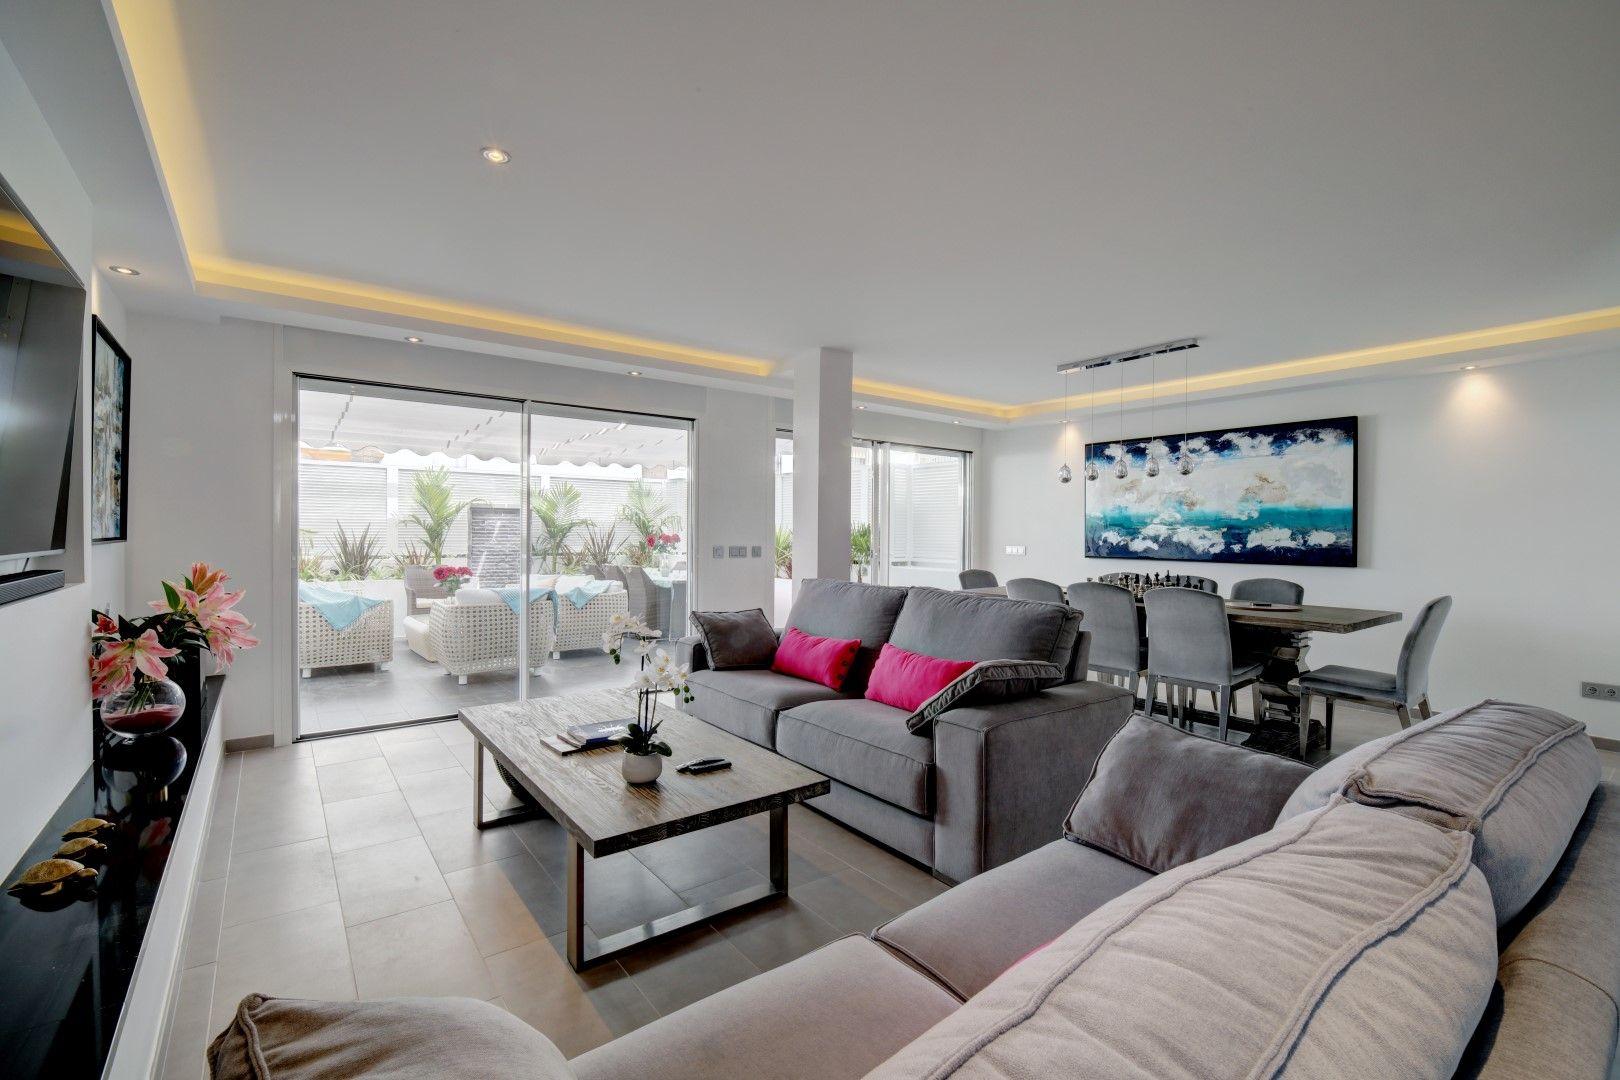 Casa Luna – Popular Marbellamar Holiday Home